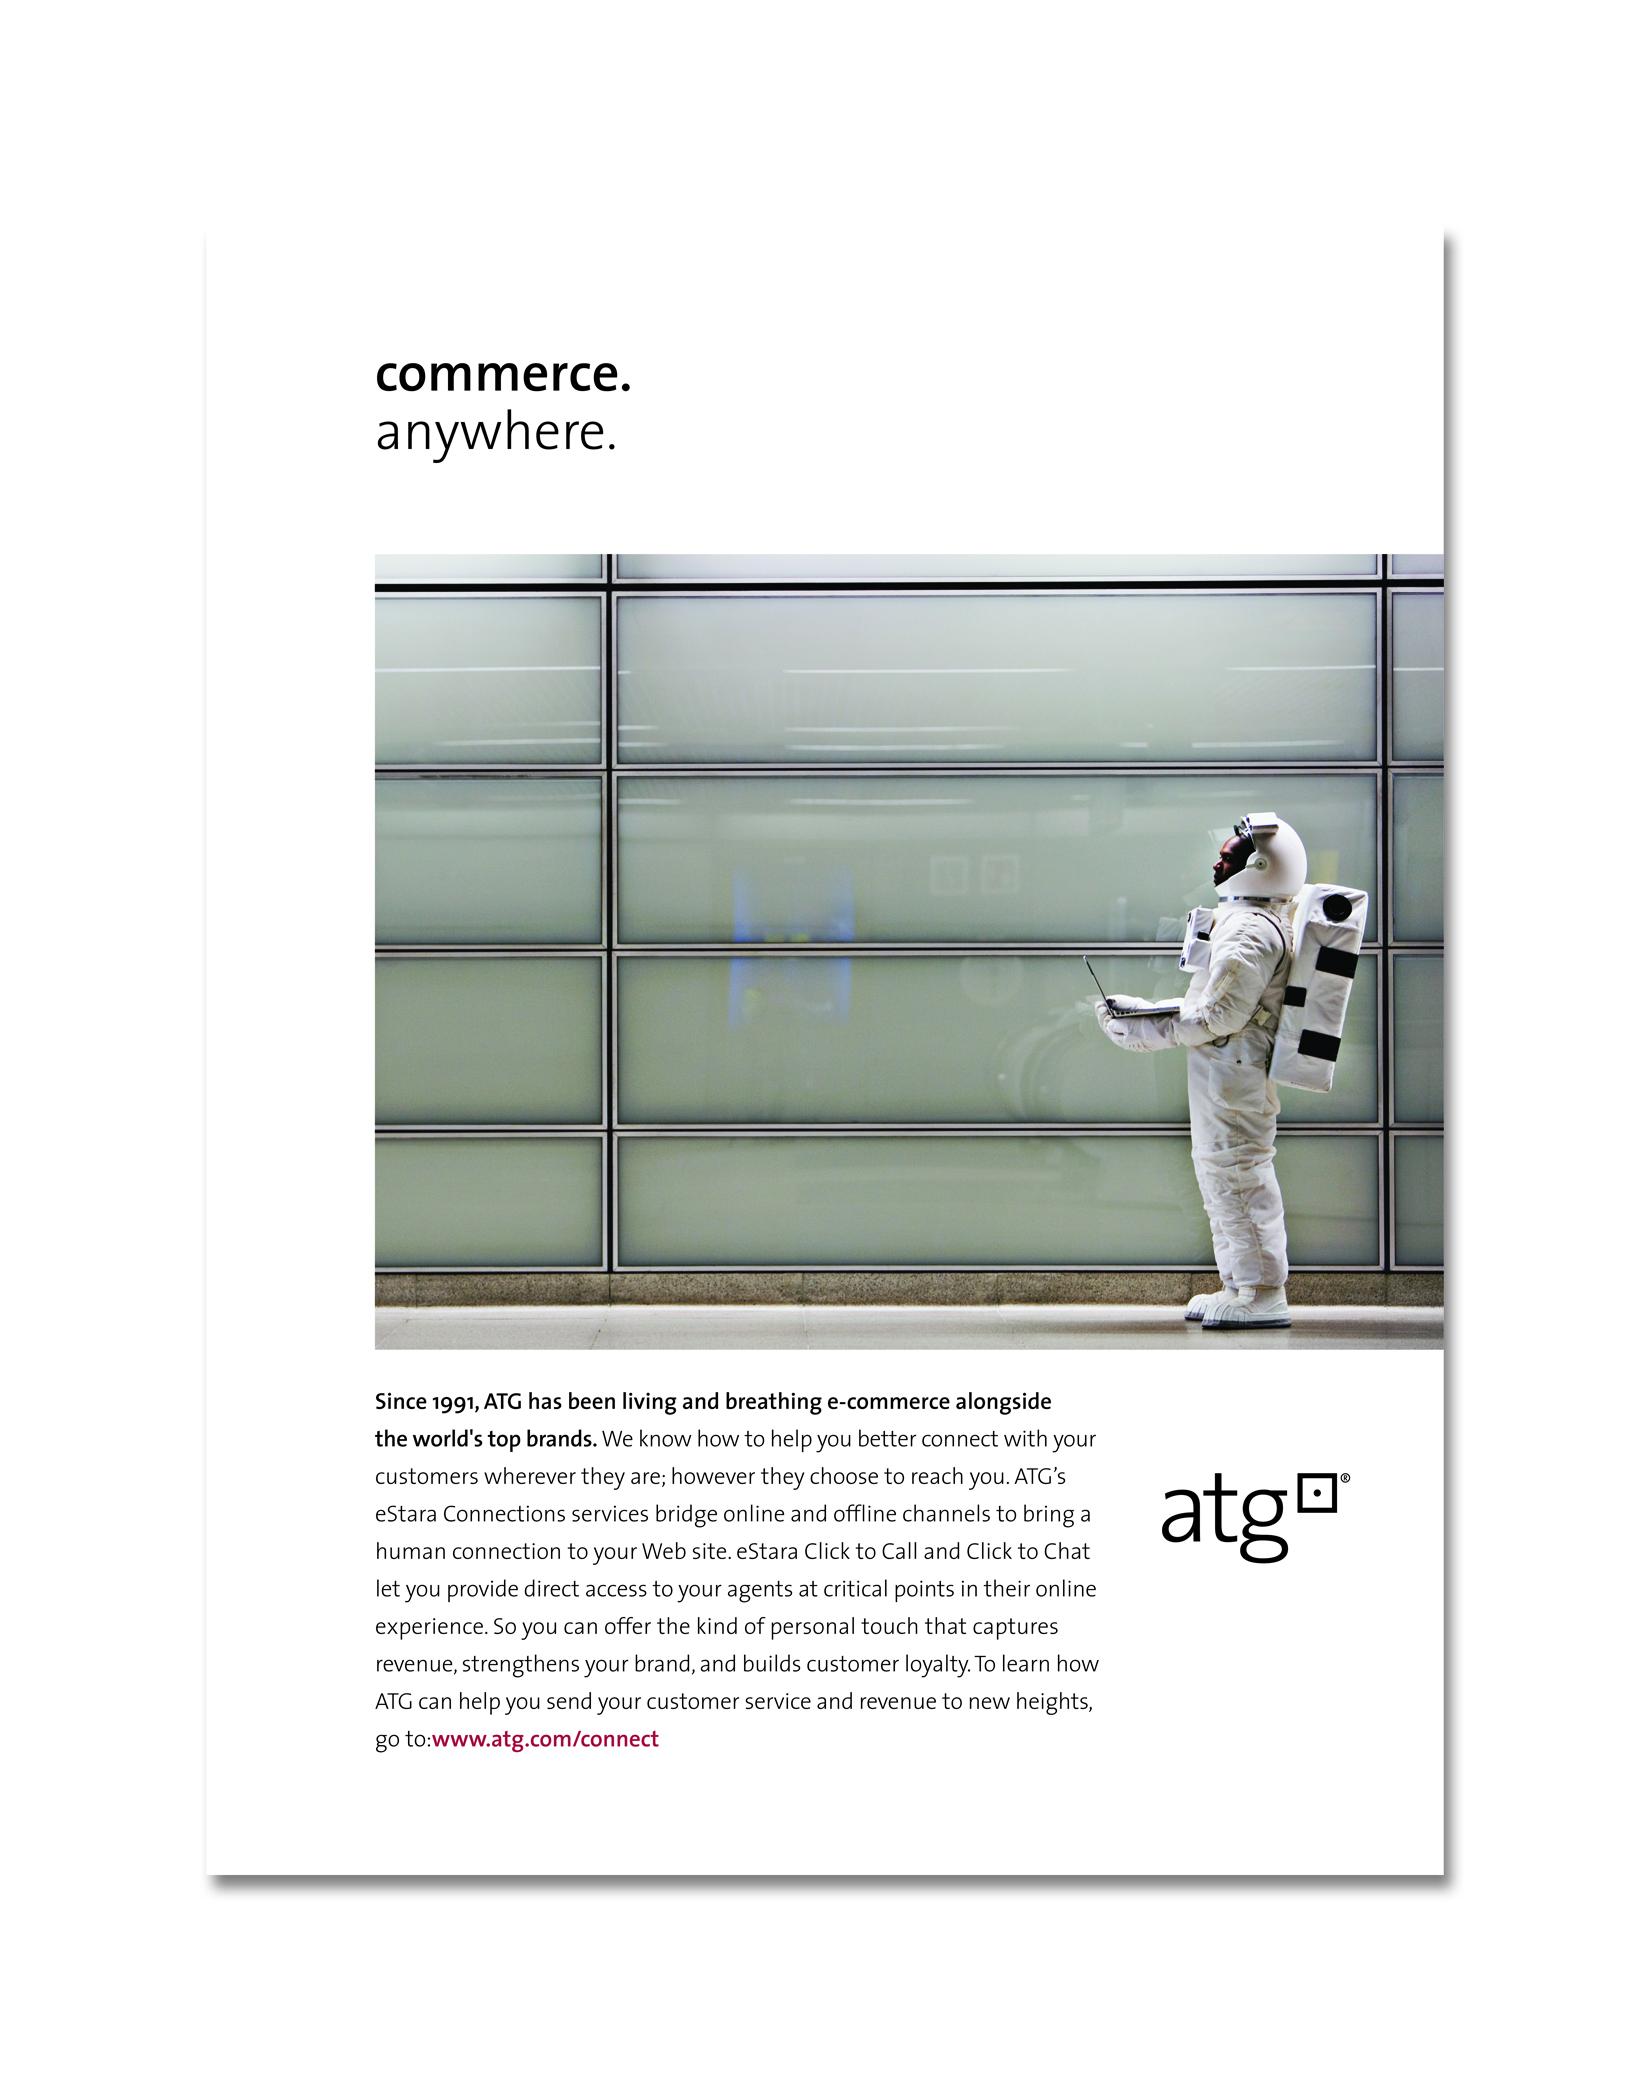 ATG_astronaut.jpg